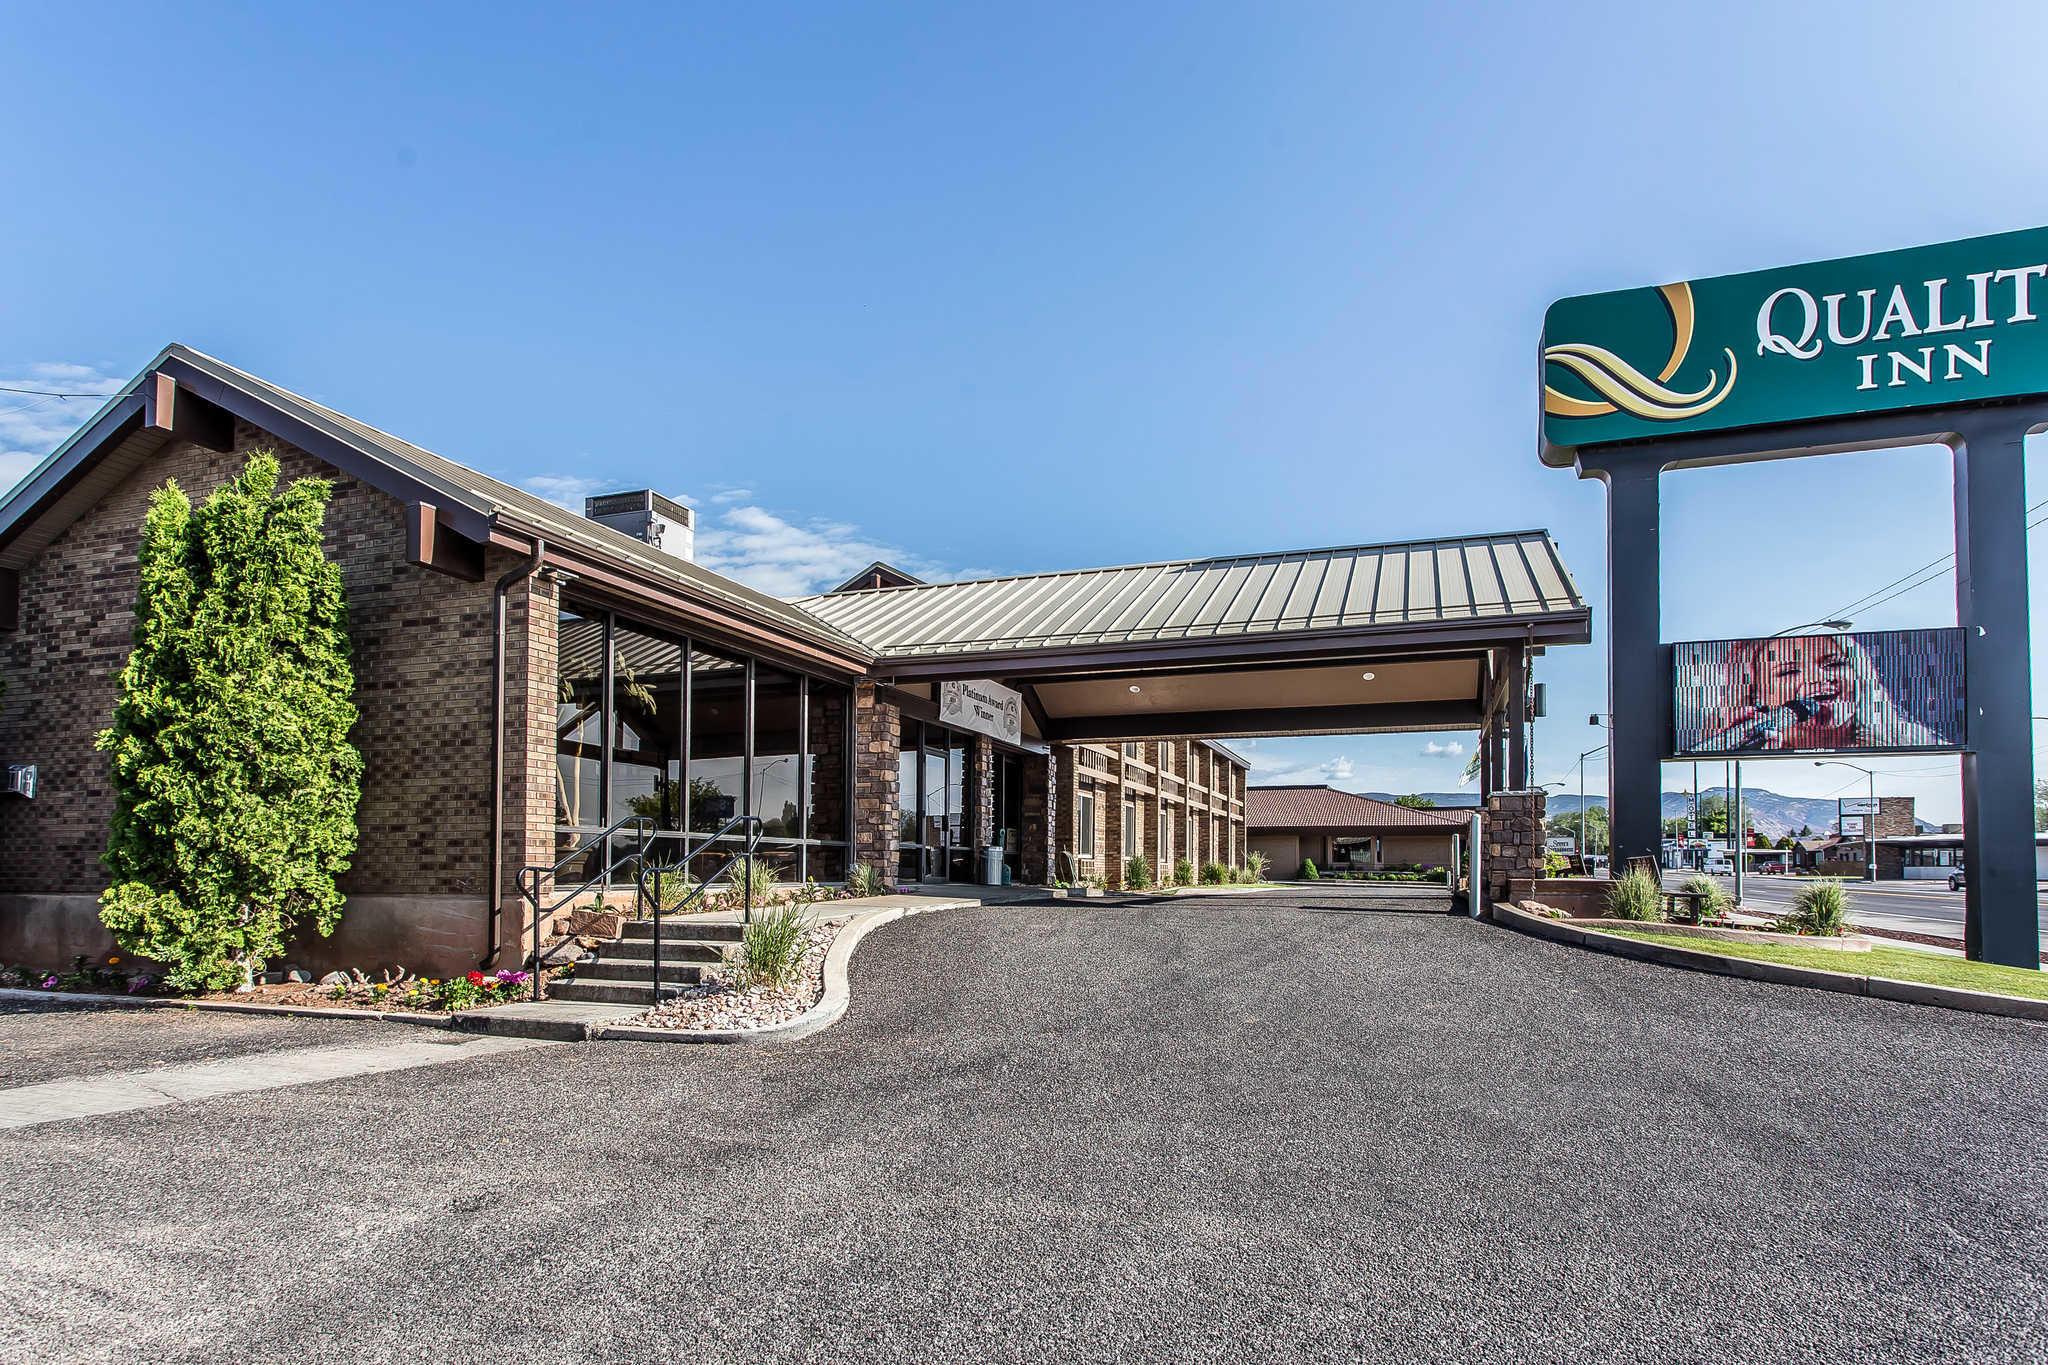 Richfield Utah Hotels And Motels